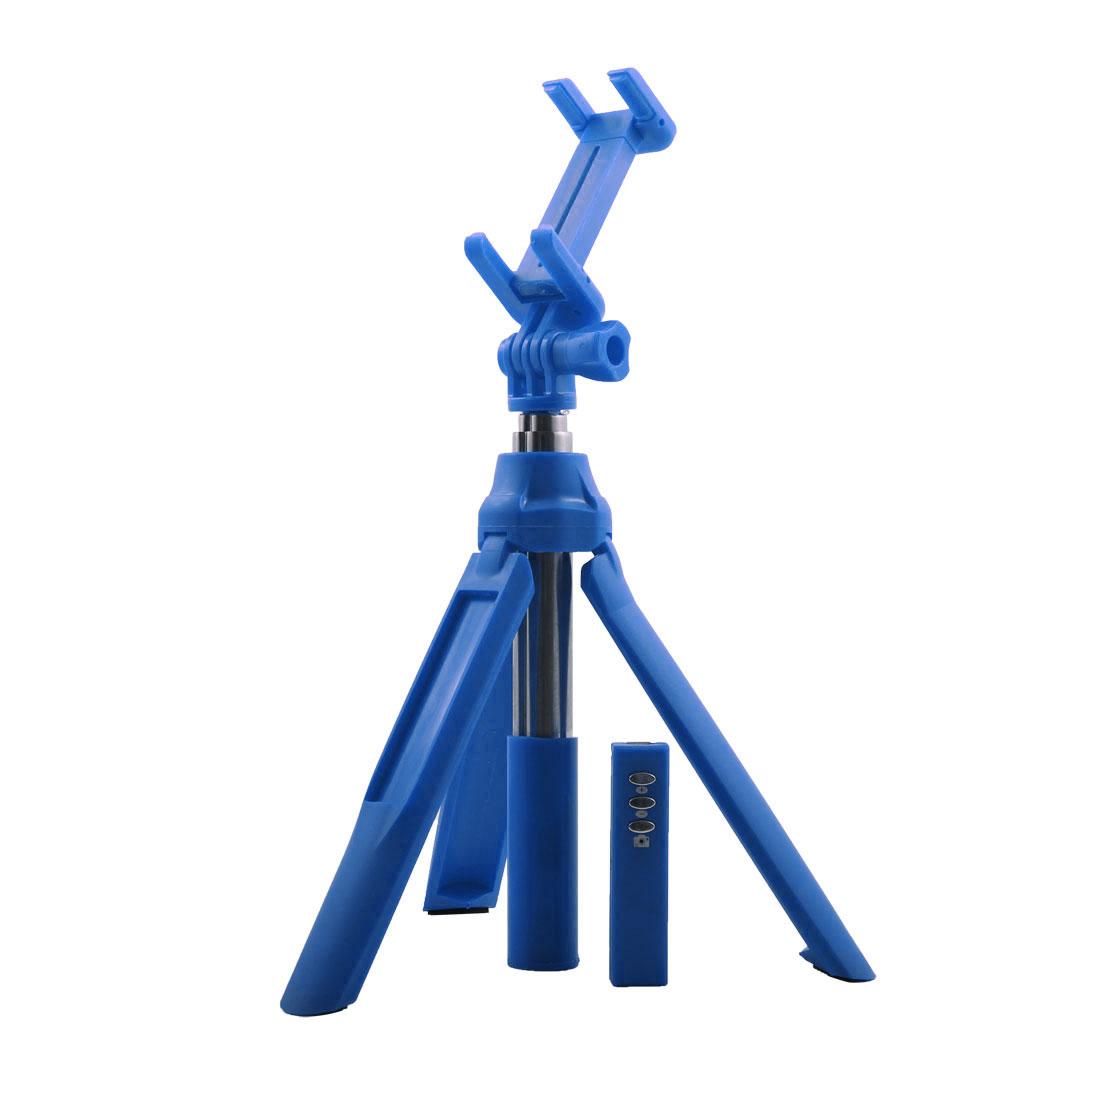 Smartphone Wireless bluetooth Remote Shutter Handheld Selfie Stick Tripod Holder Set Blue